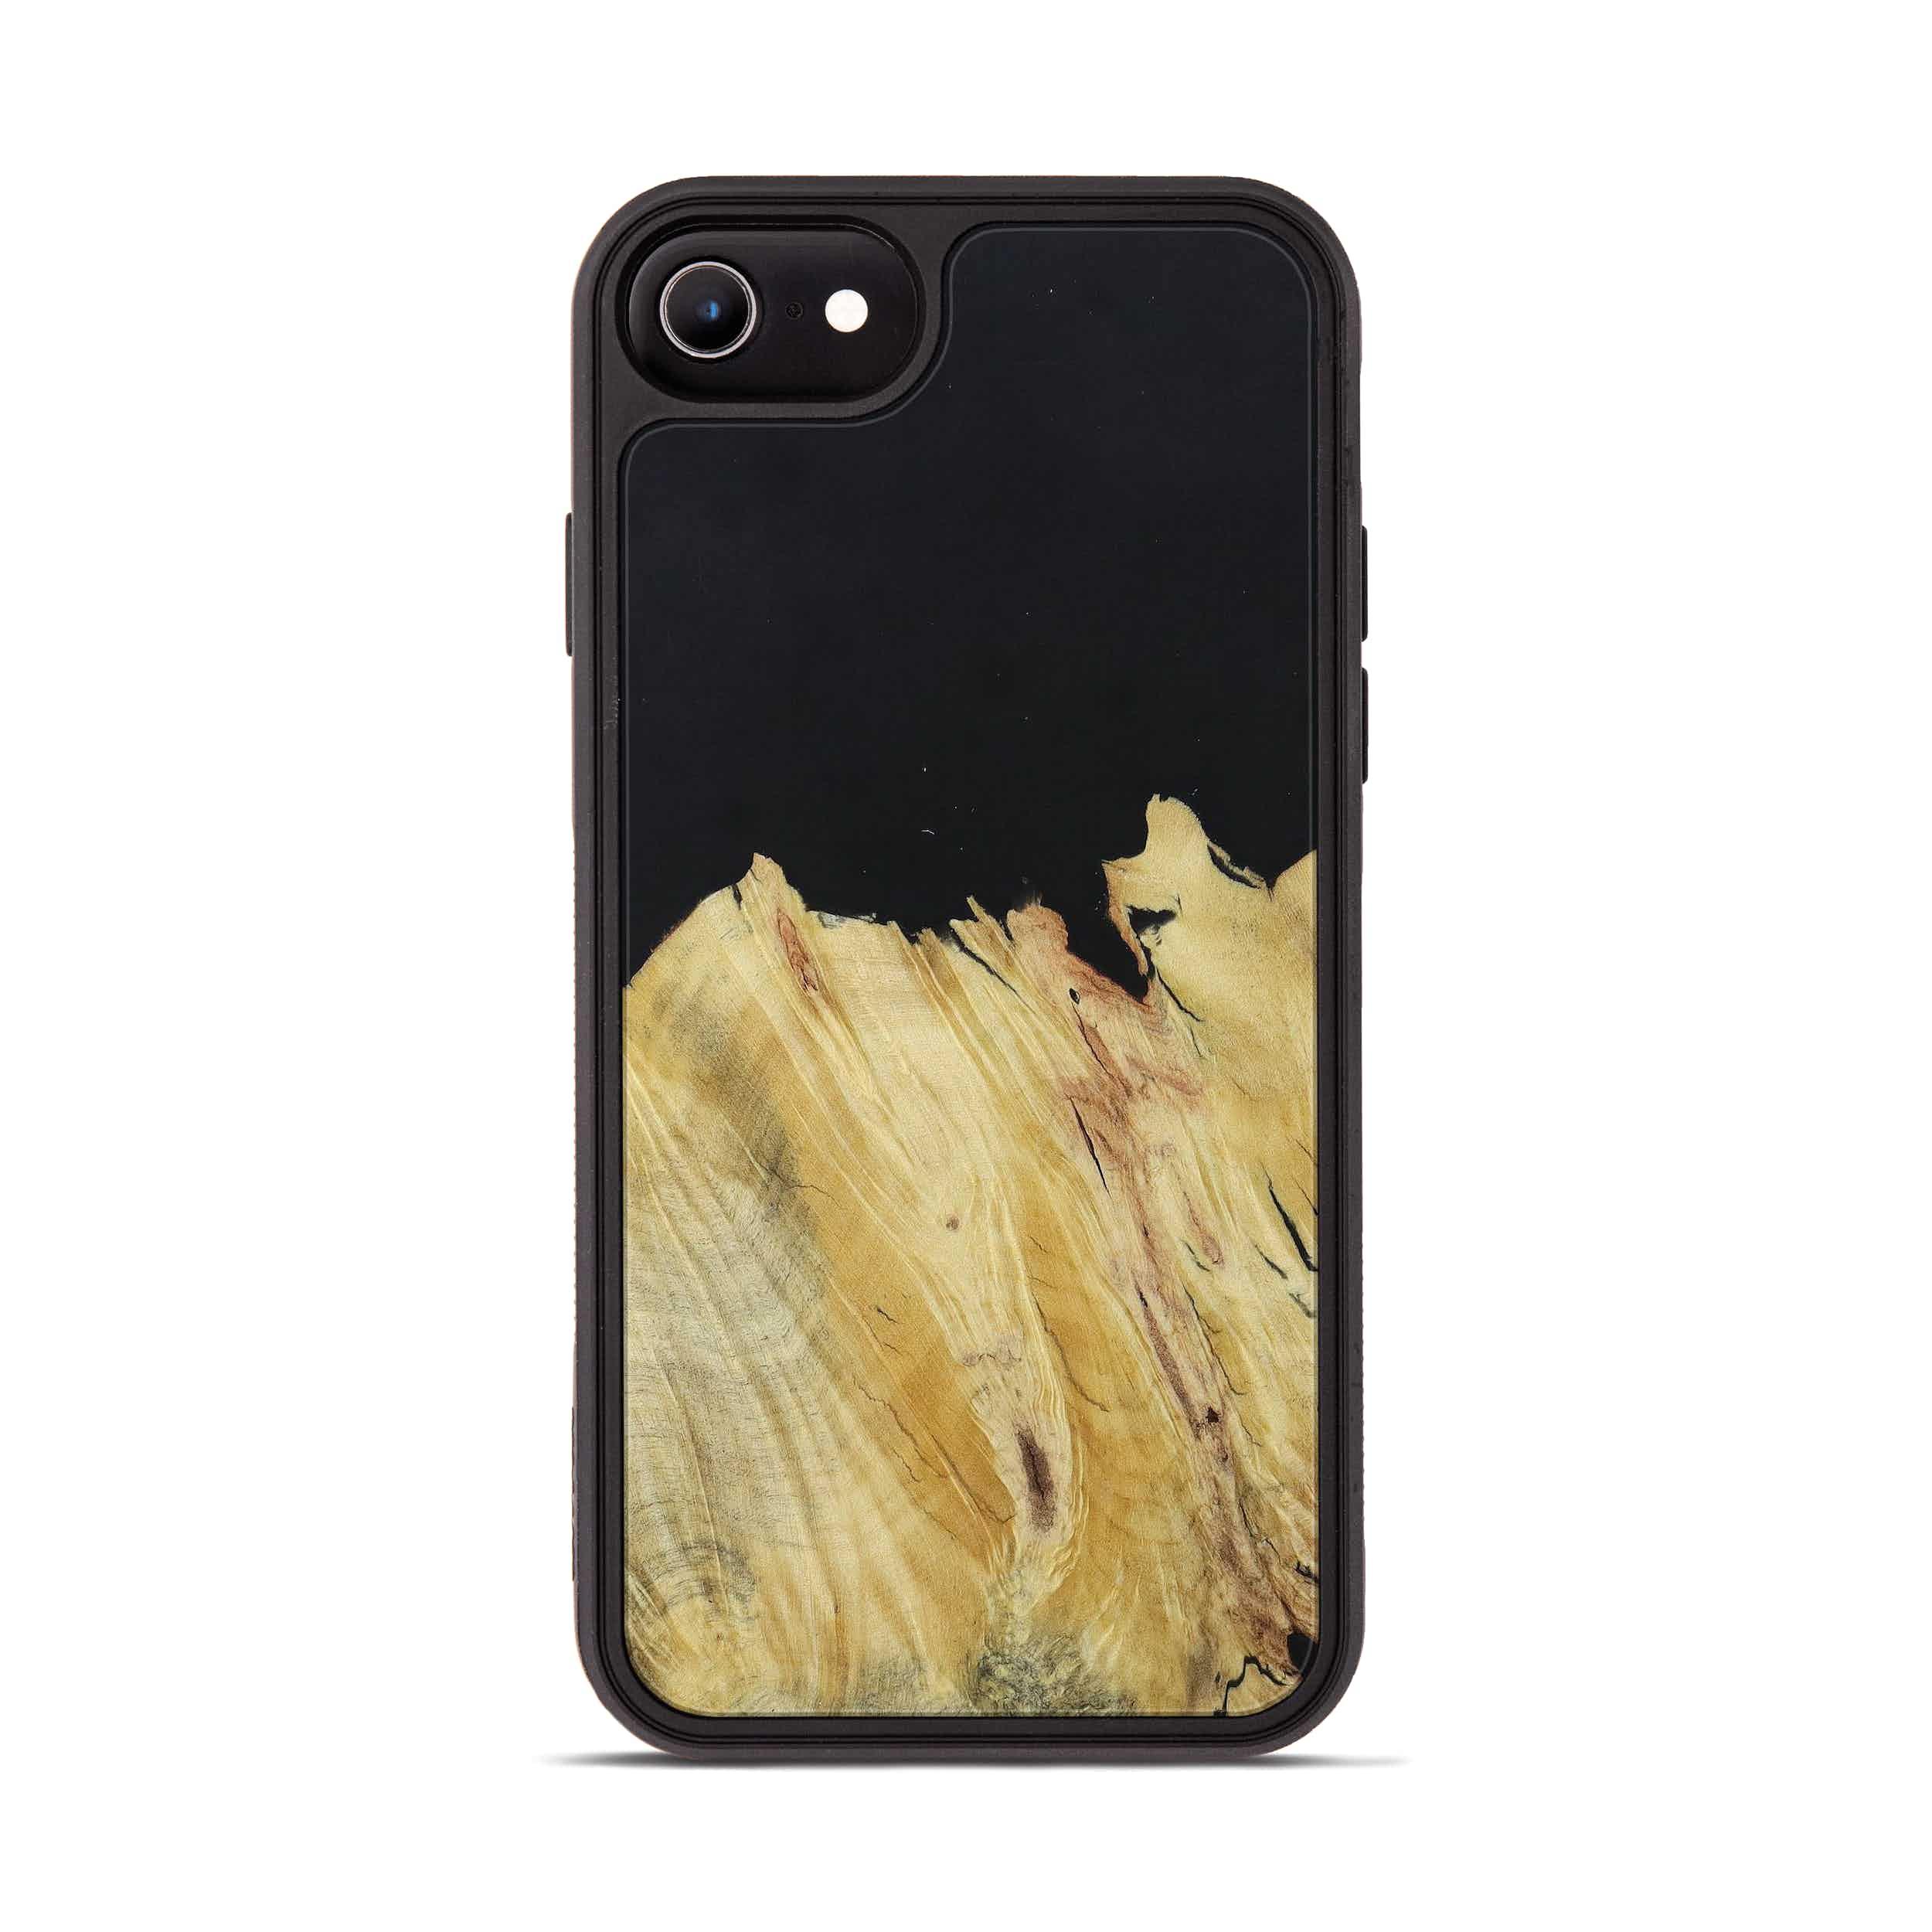 iPhone 6s Wood+Resin Phone Case - Matthew (Pure Black, 395165)